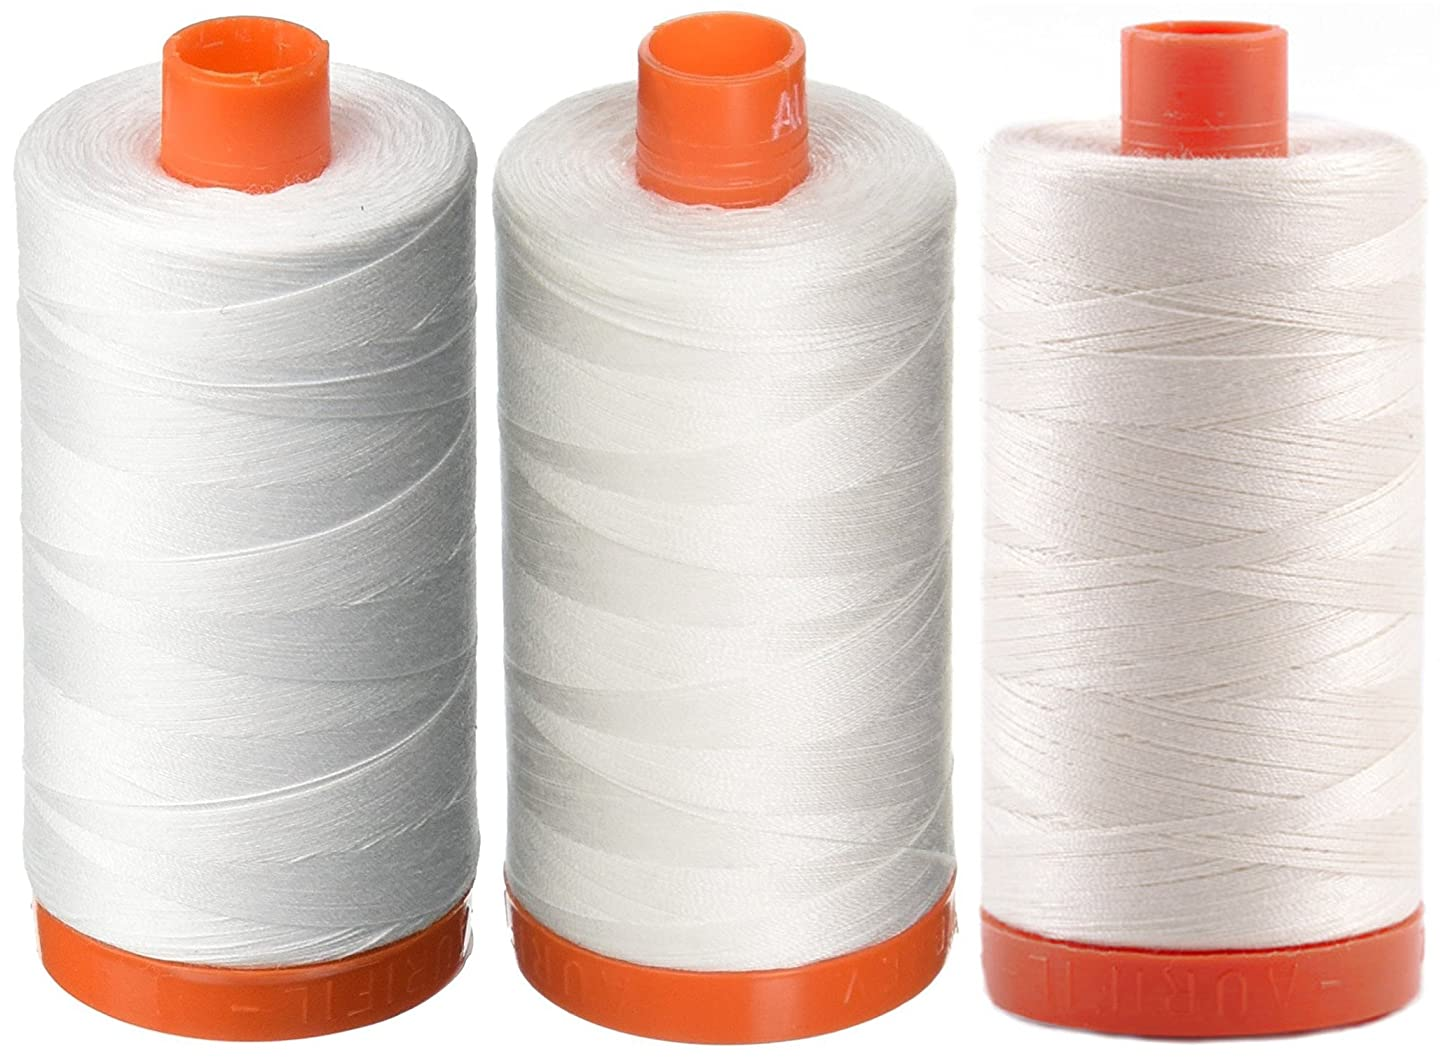 3-PACK - Aurifil 50WT - White + Natural White + Chalk, Solid - Mako Cotton Thread - 1422Yds EACH